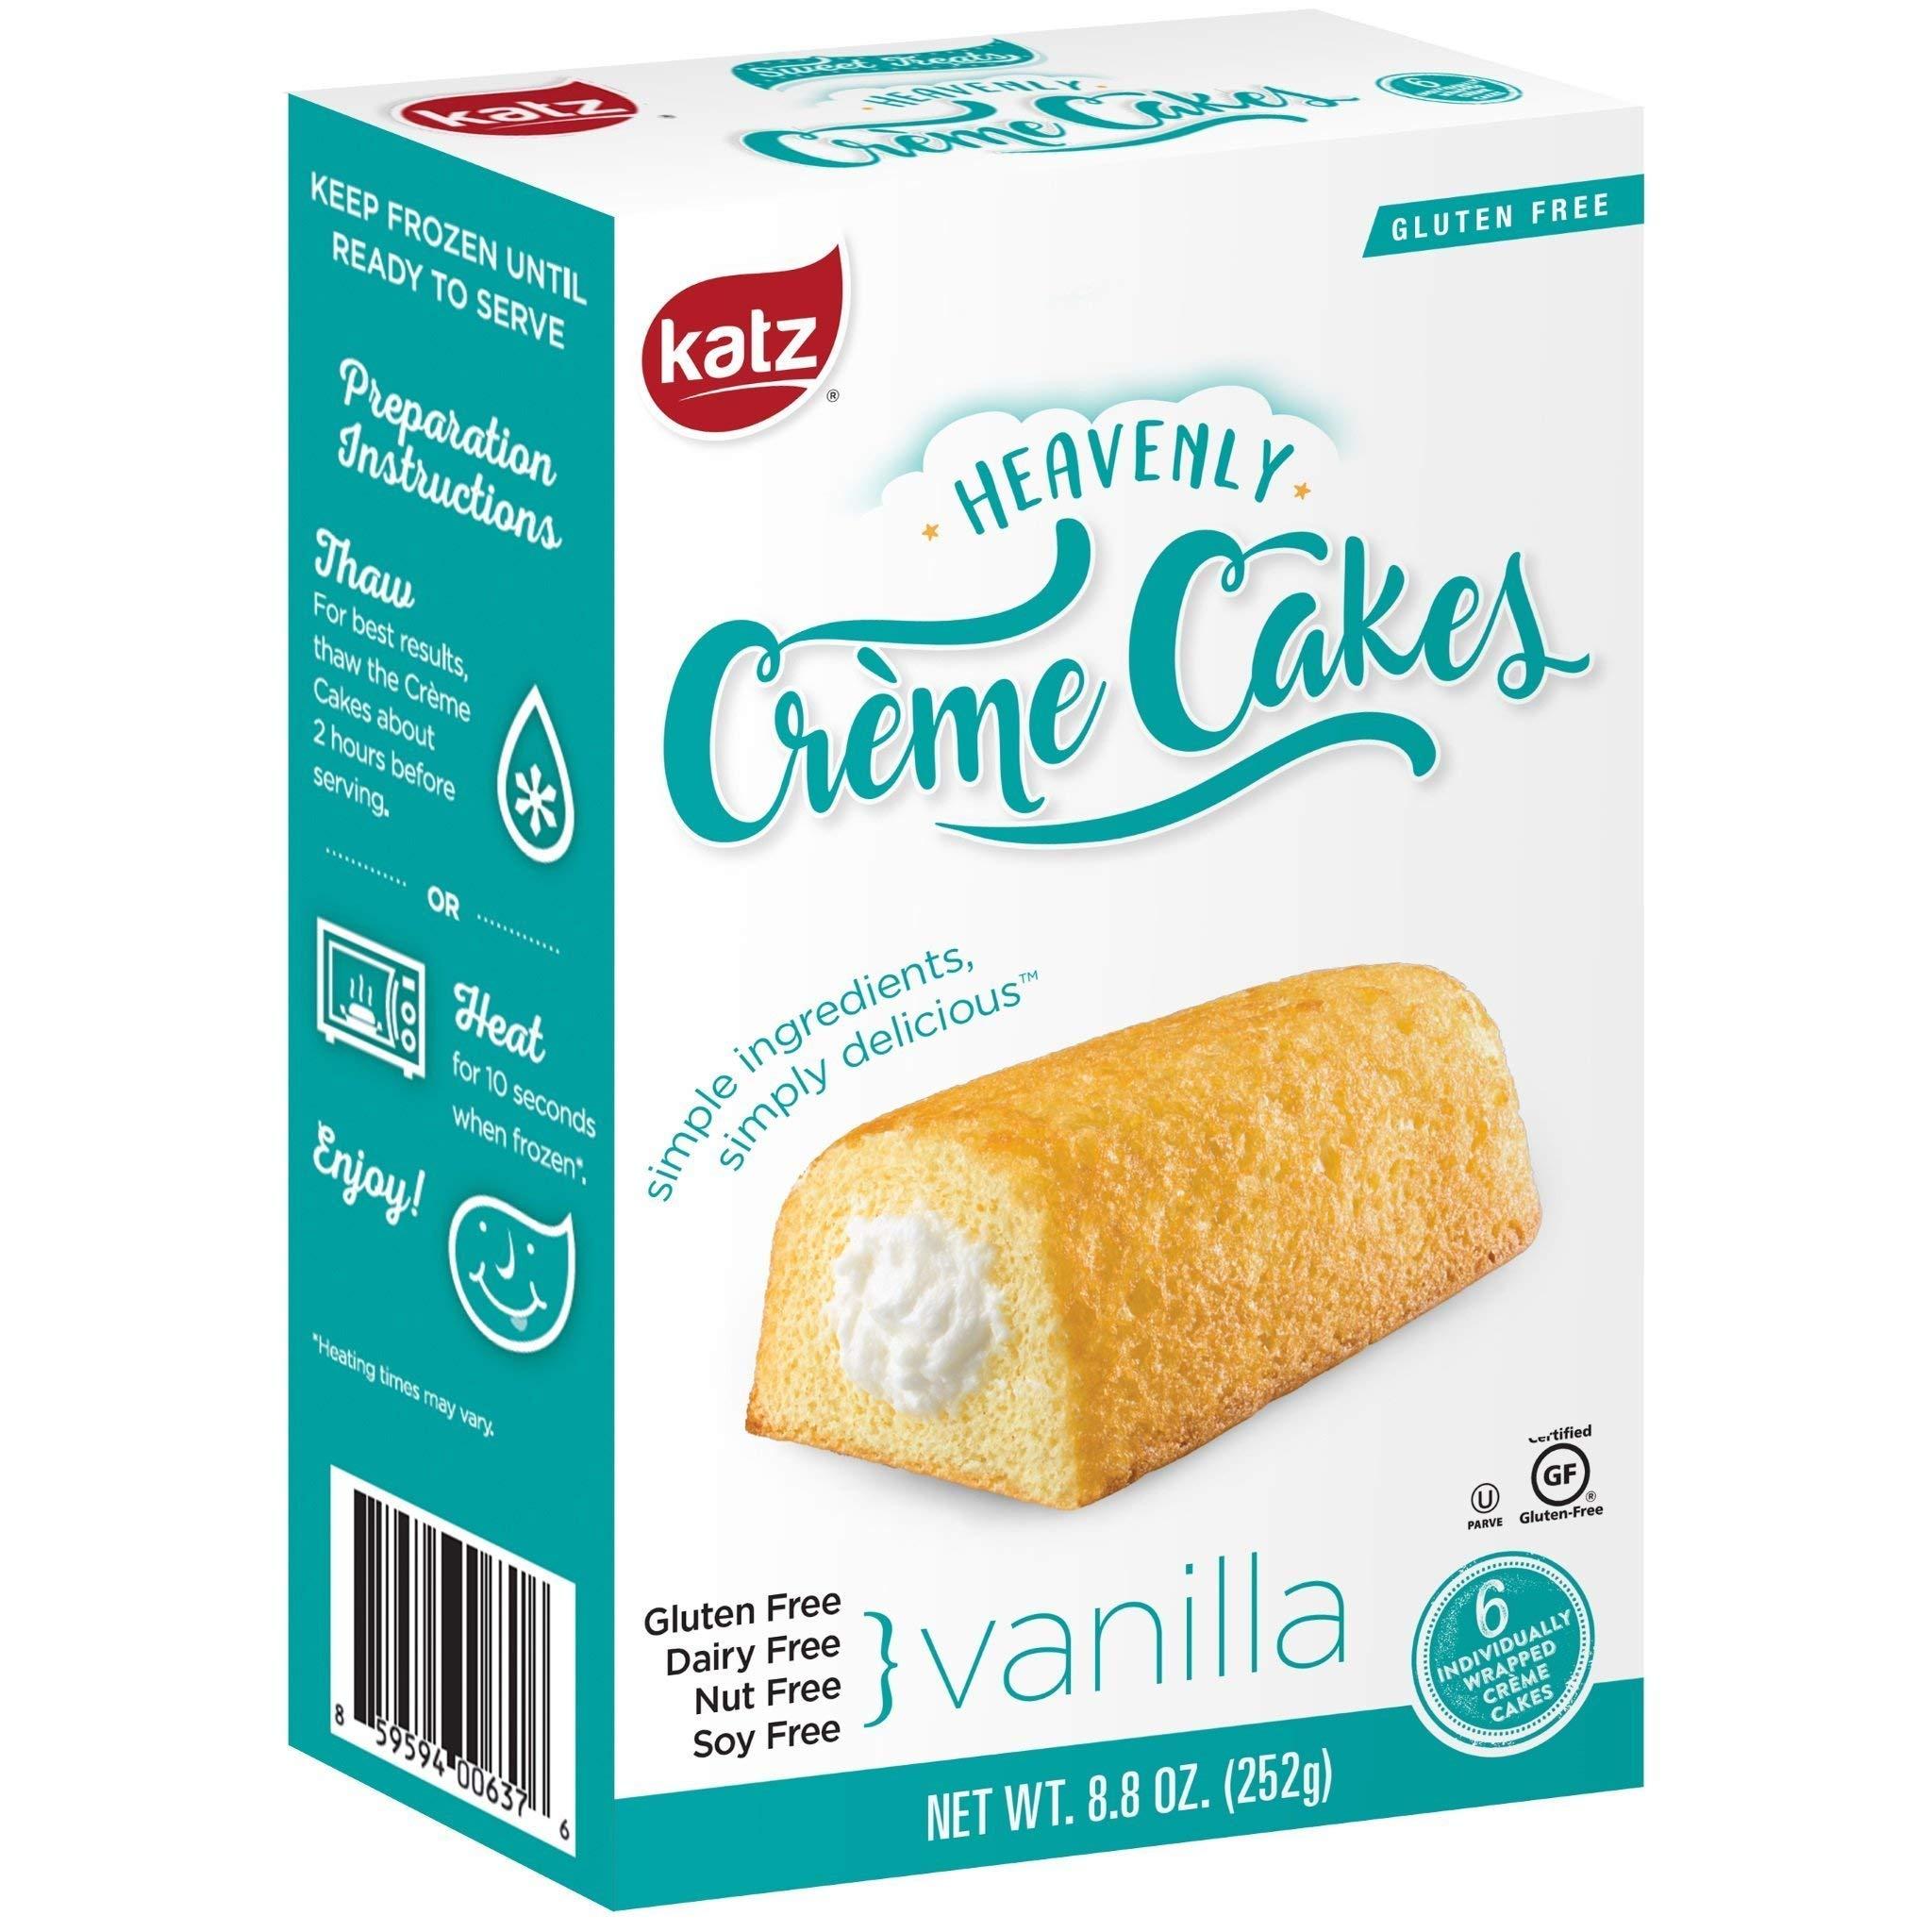 Katz Gluten Free Vanilla Crème Cakes | Dairy, Nut, Soy and Gluten Free | Kosher (3 Packs of 6 Crème Cakes, 8.8 Ounce Each) by Katz Gluten Free